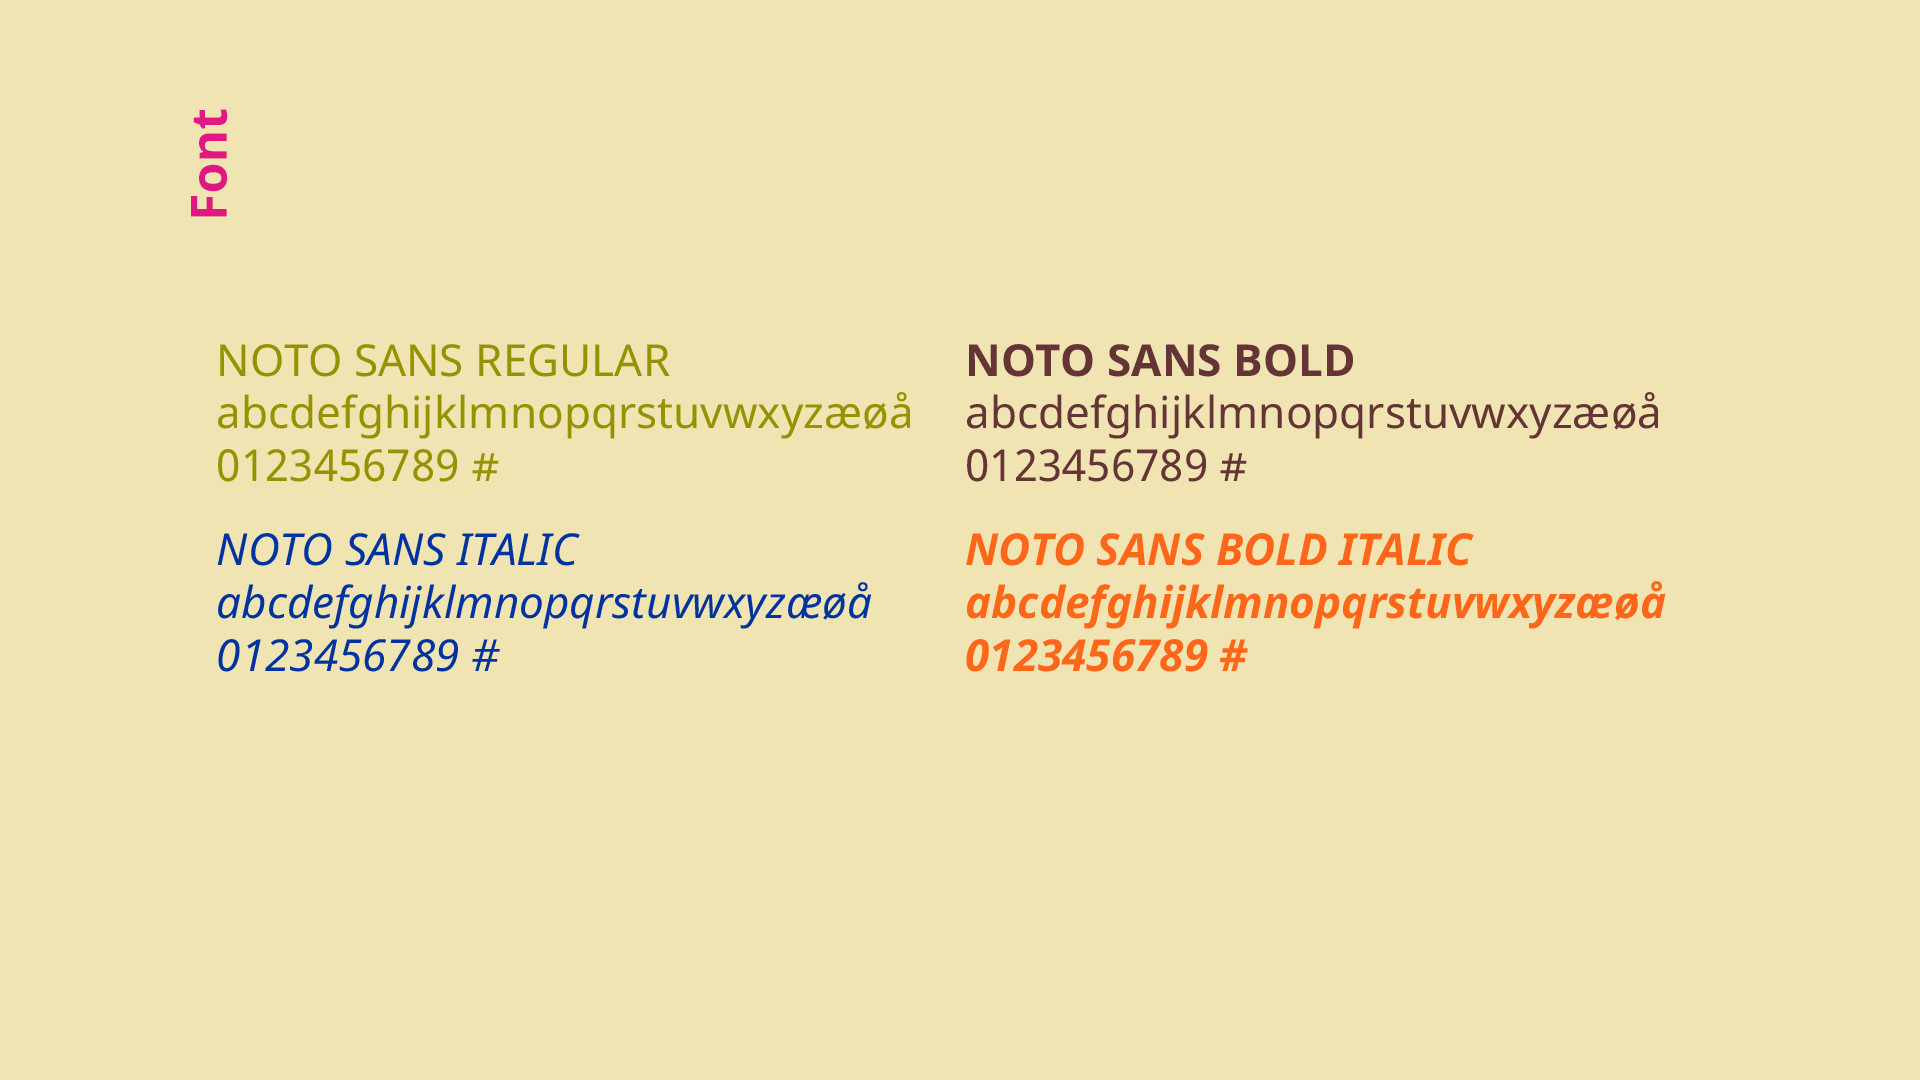 Profil_natiwe_buckethaus_TMF_1920x1080px